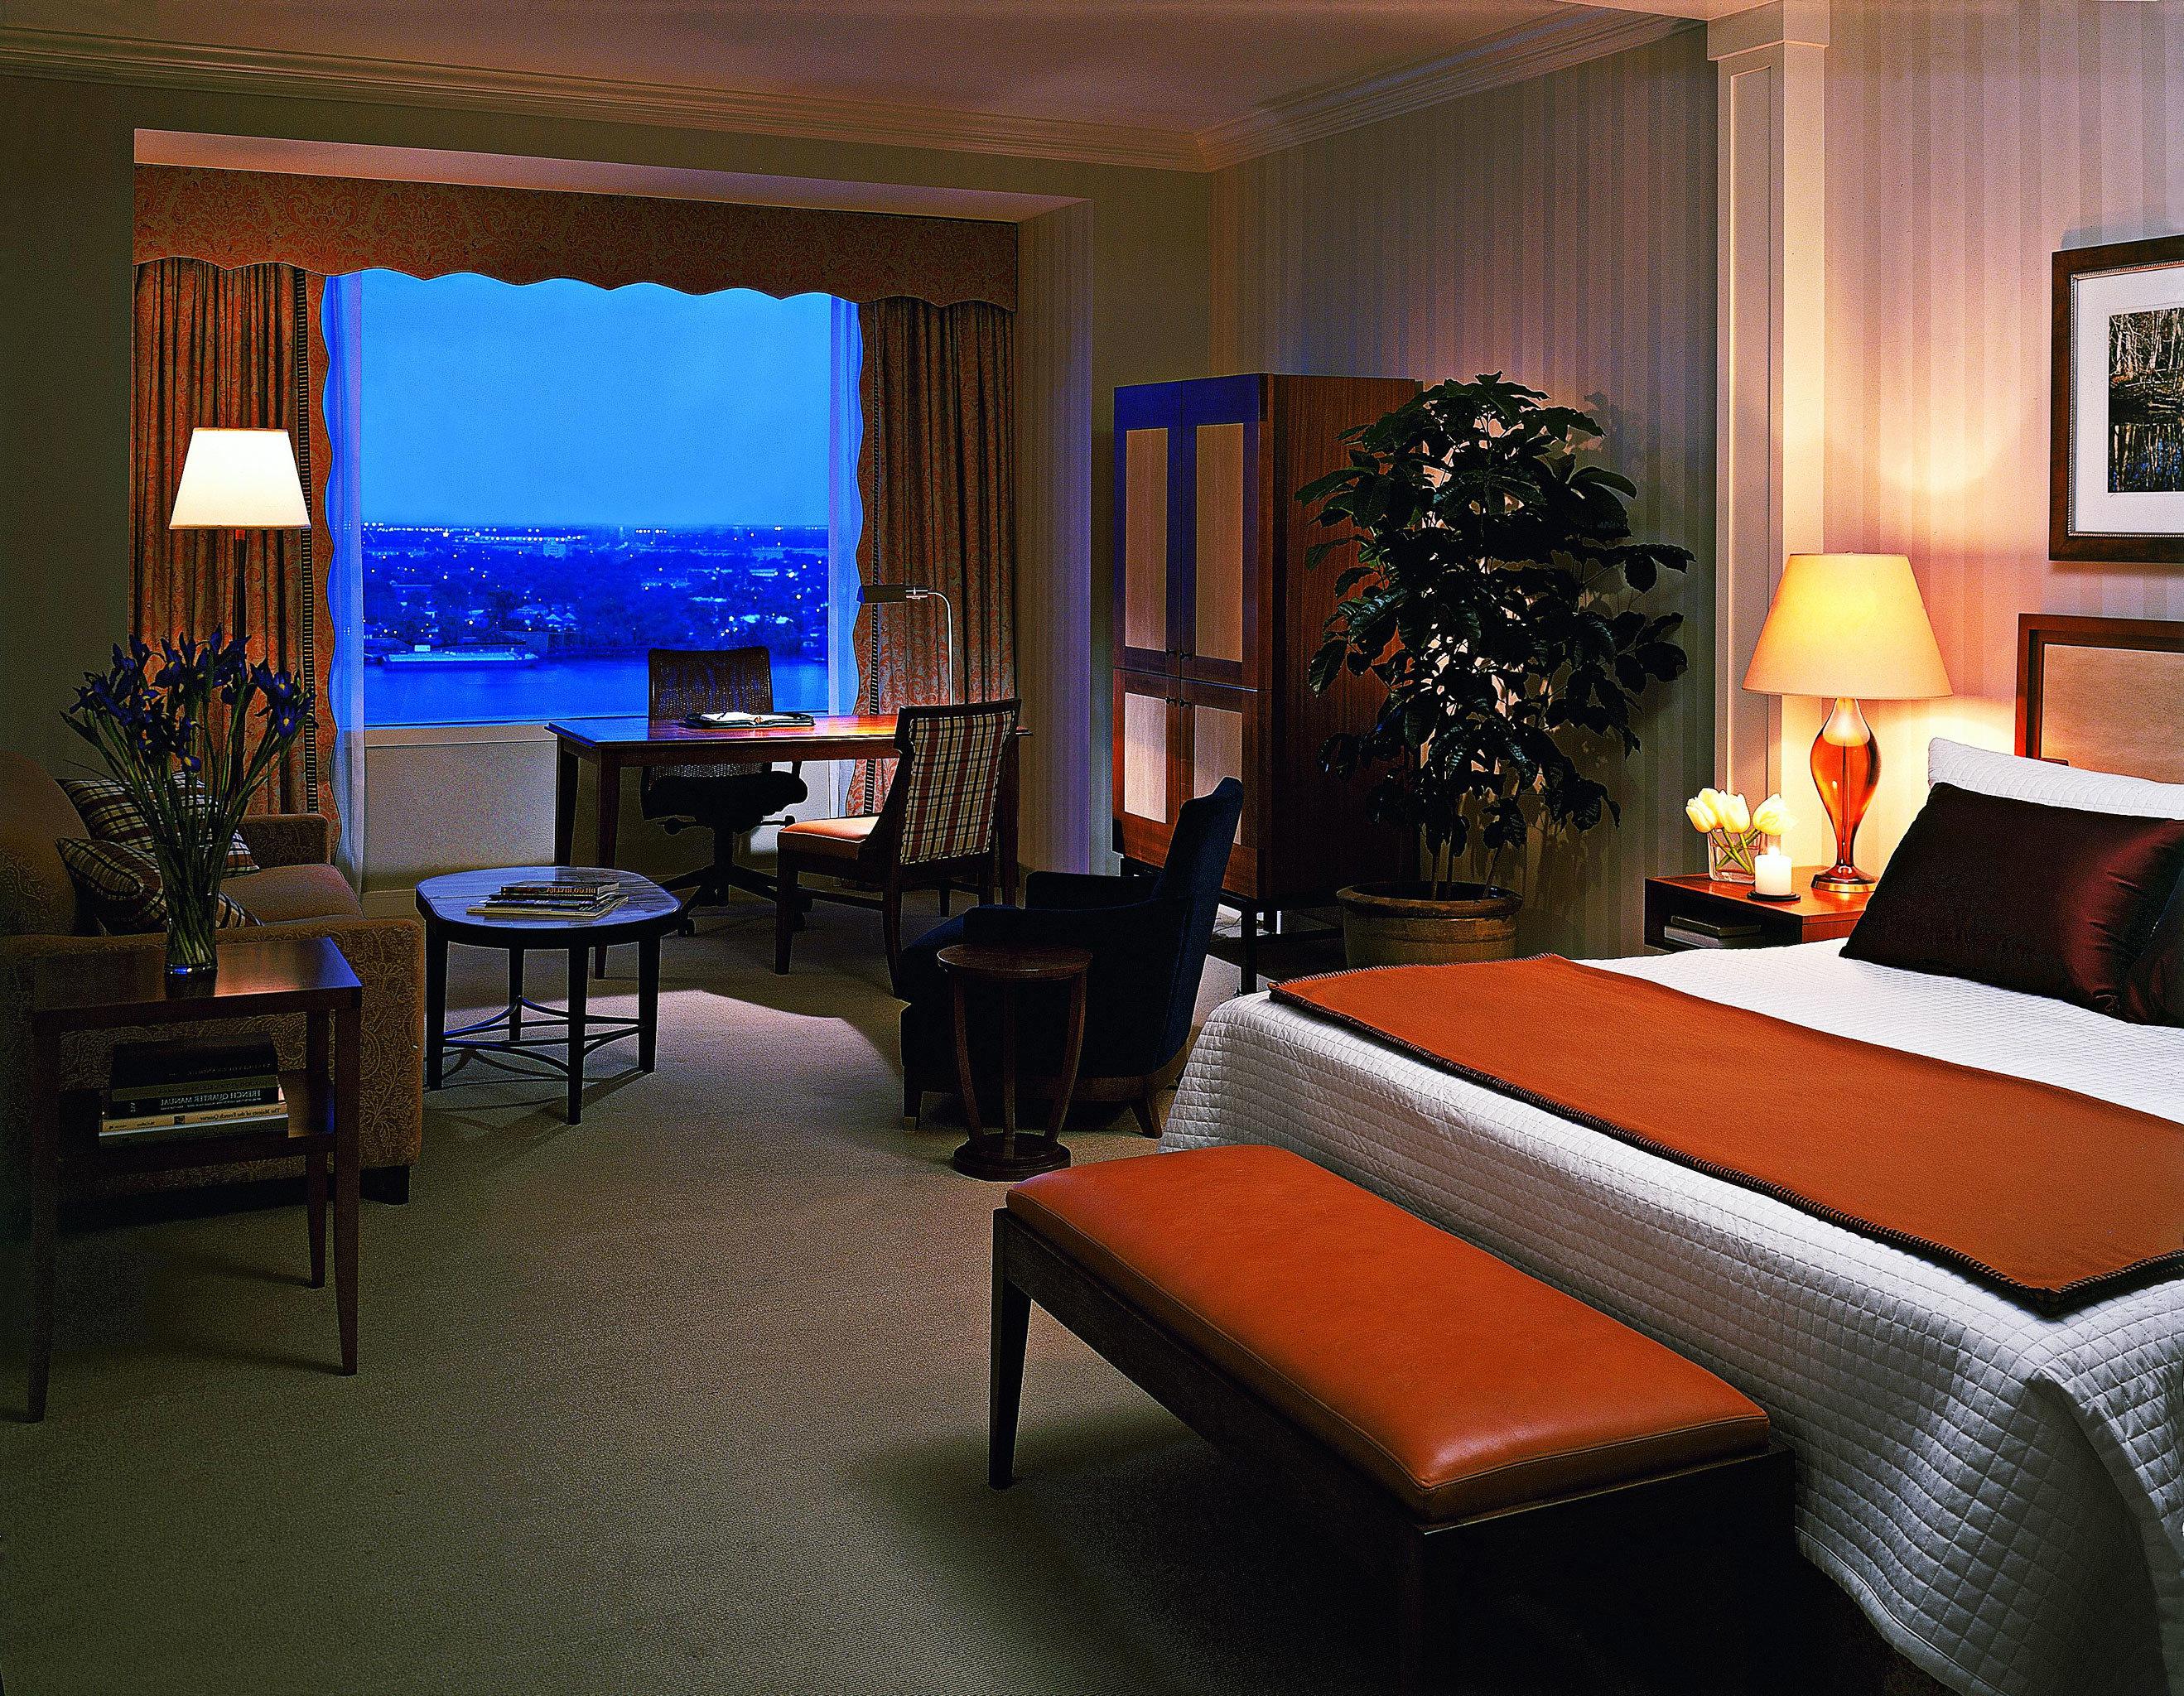 Bedroom Luxury Modern Suite property living room recreation room condominium Resort conference hall restaurant Lobby